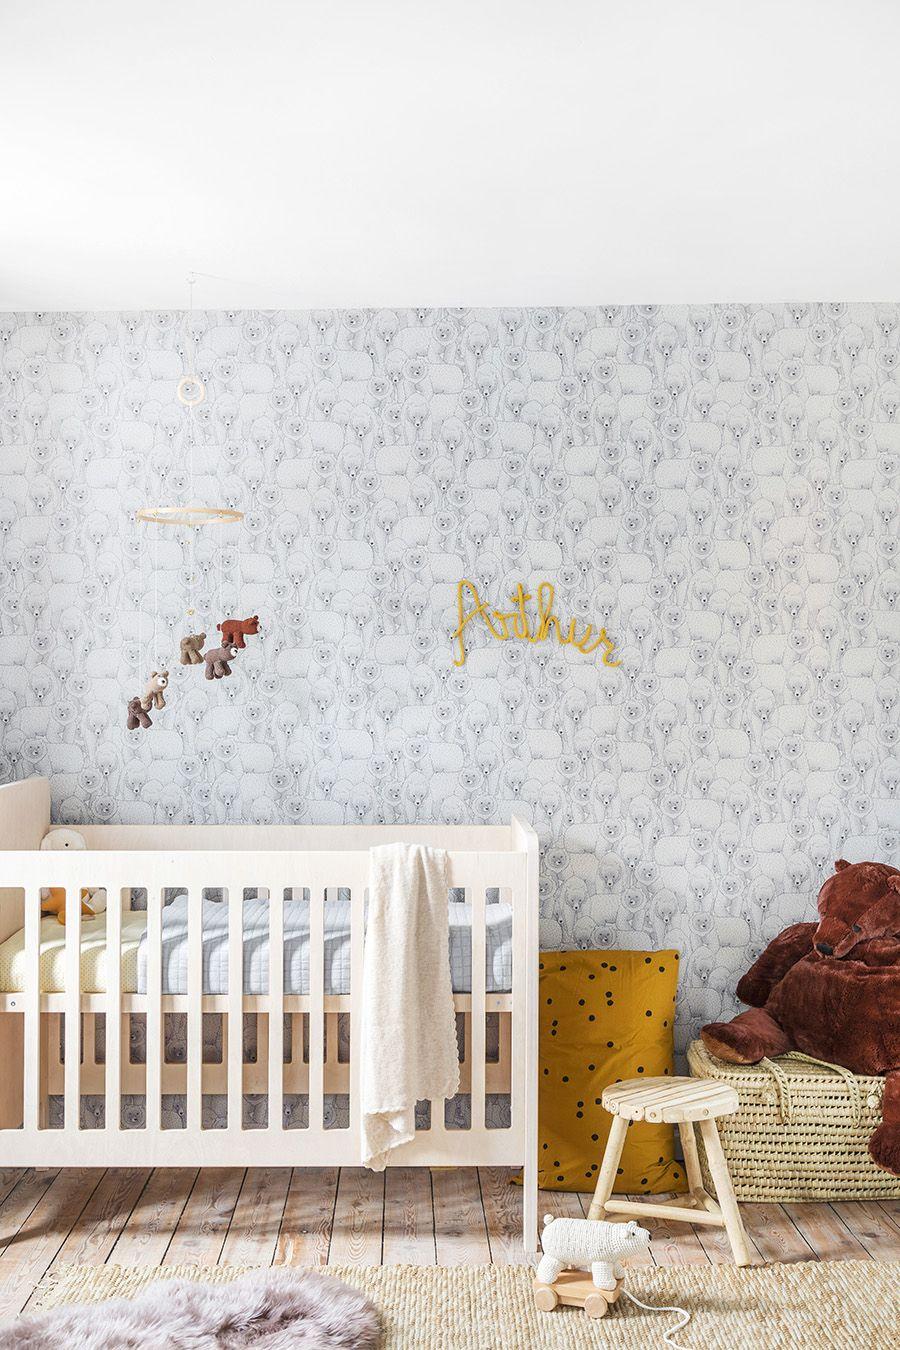 Babykamer Groen Blauw.Babykamer Vol Zelfmakers Ariadne At Home Kinderkamer Groen Blauw